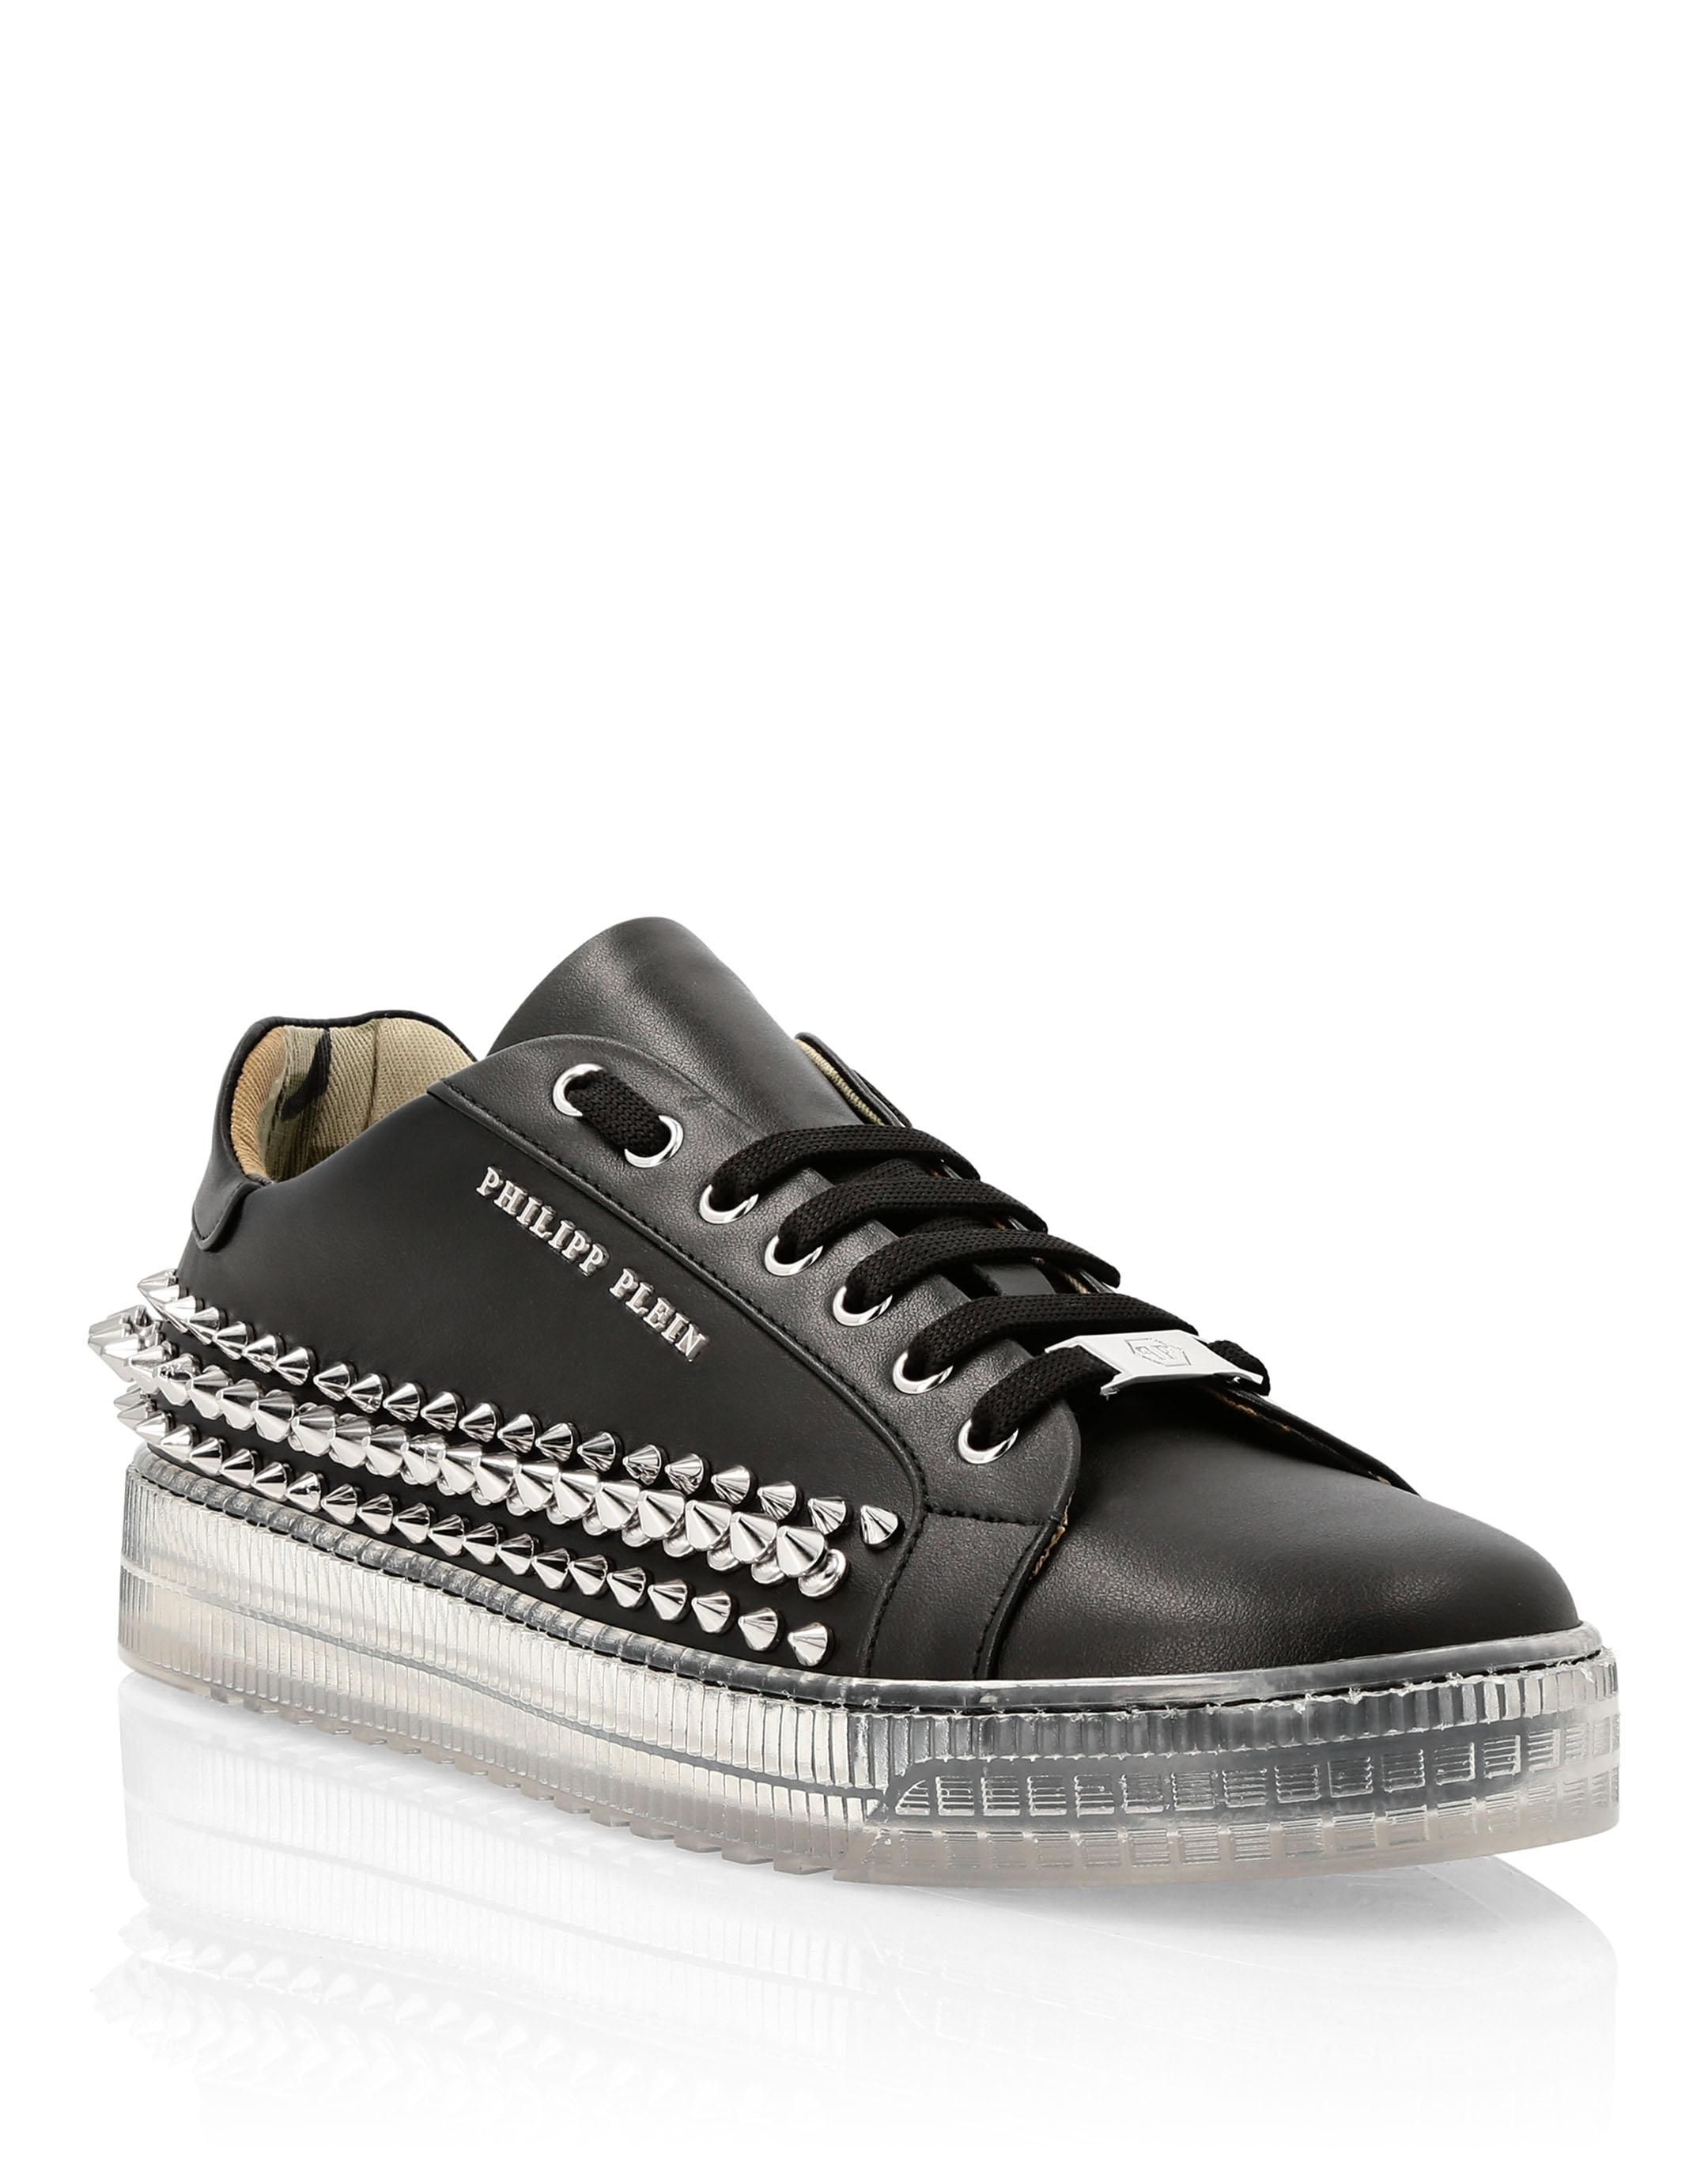 Lo-Top Sneakers Studs | Philipp Plein